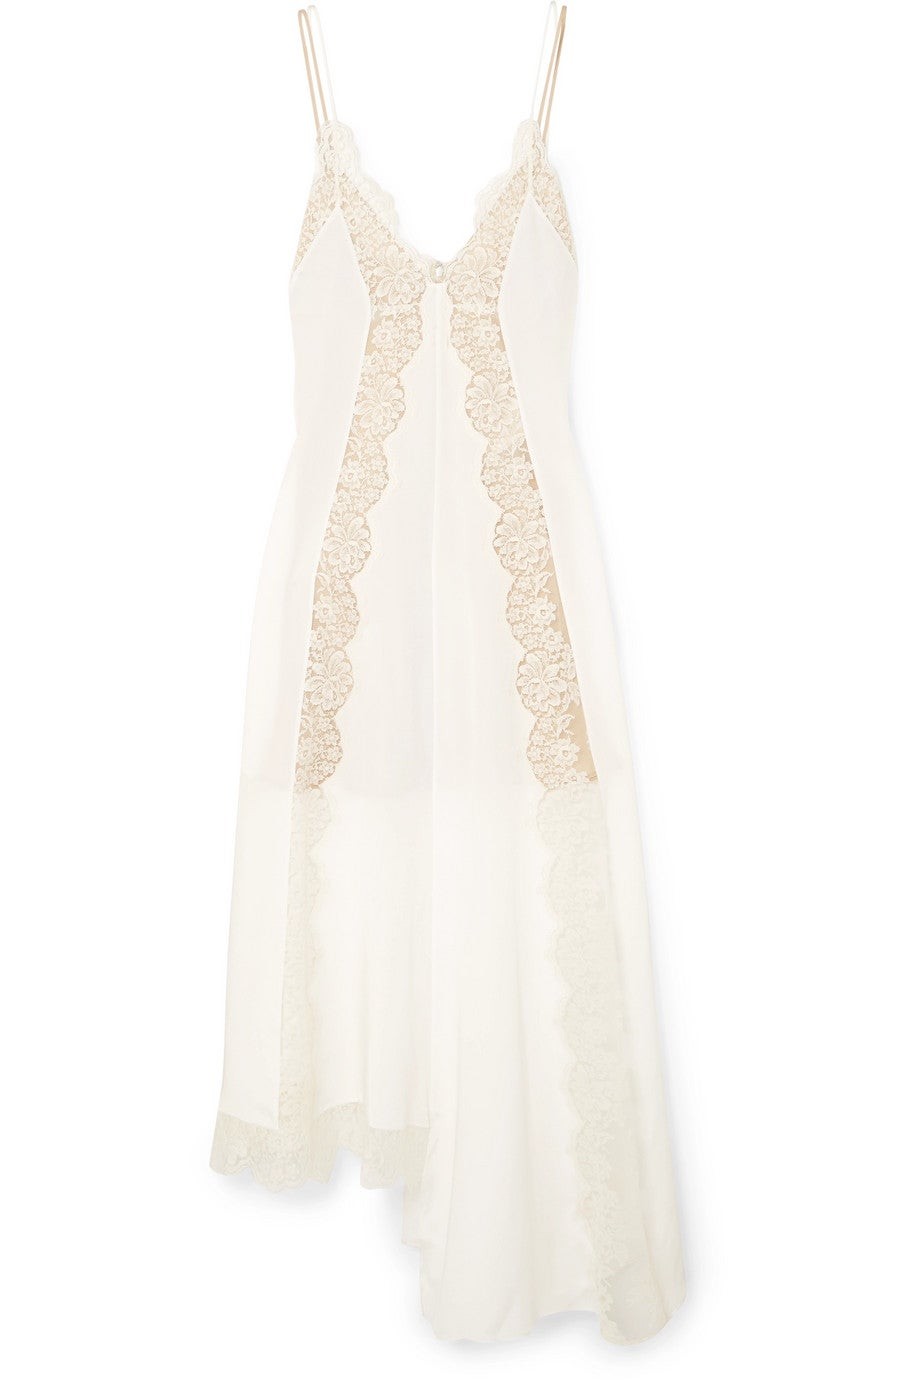 41a79b83e Stella McCartney + Asymmetric Lace-trimmed Silk Crepe de Chine Dress